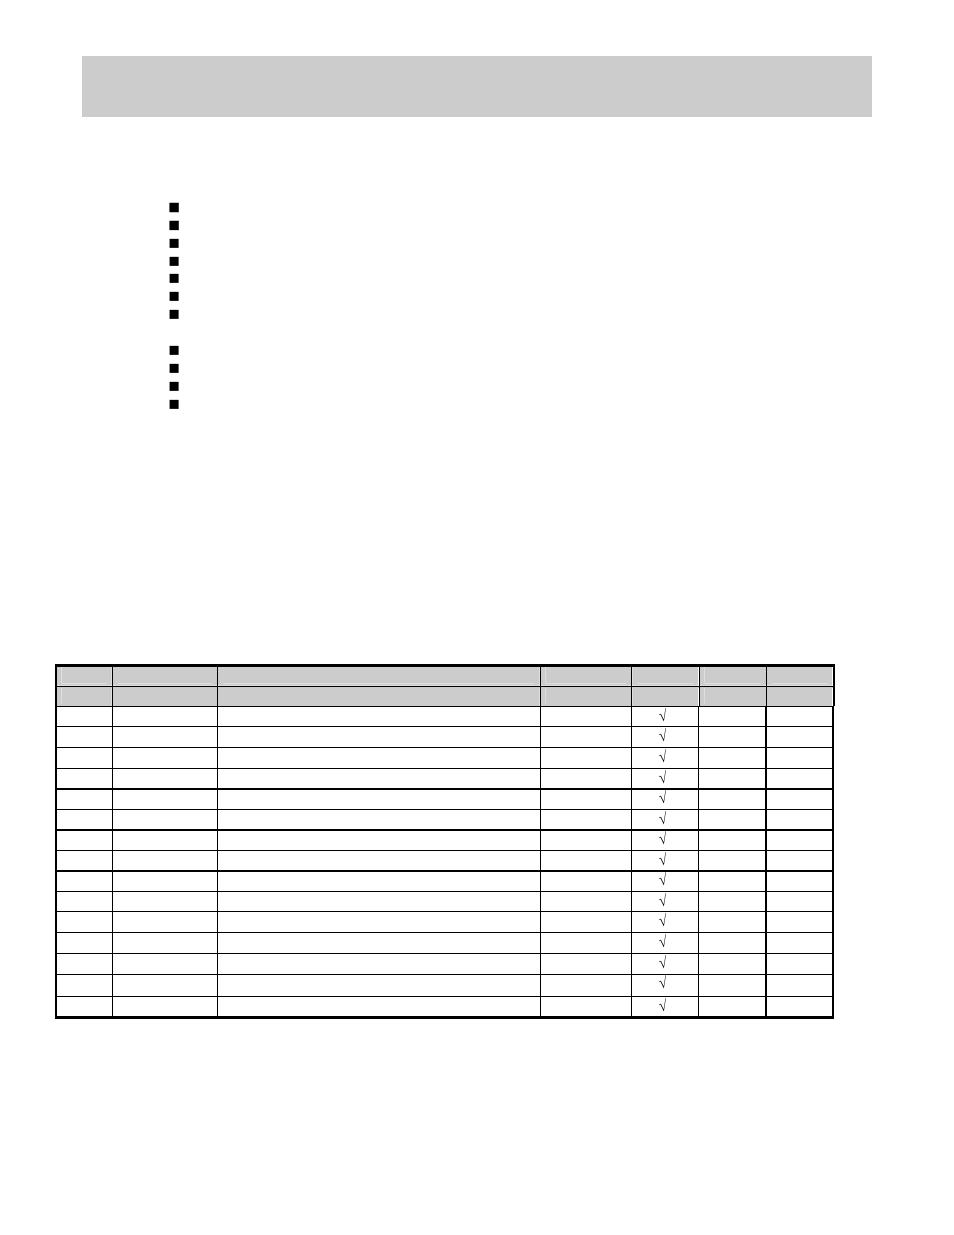 t5000 printronix recommended tools unique spares t5204 t5304 viii rh manualsdir com